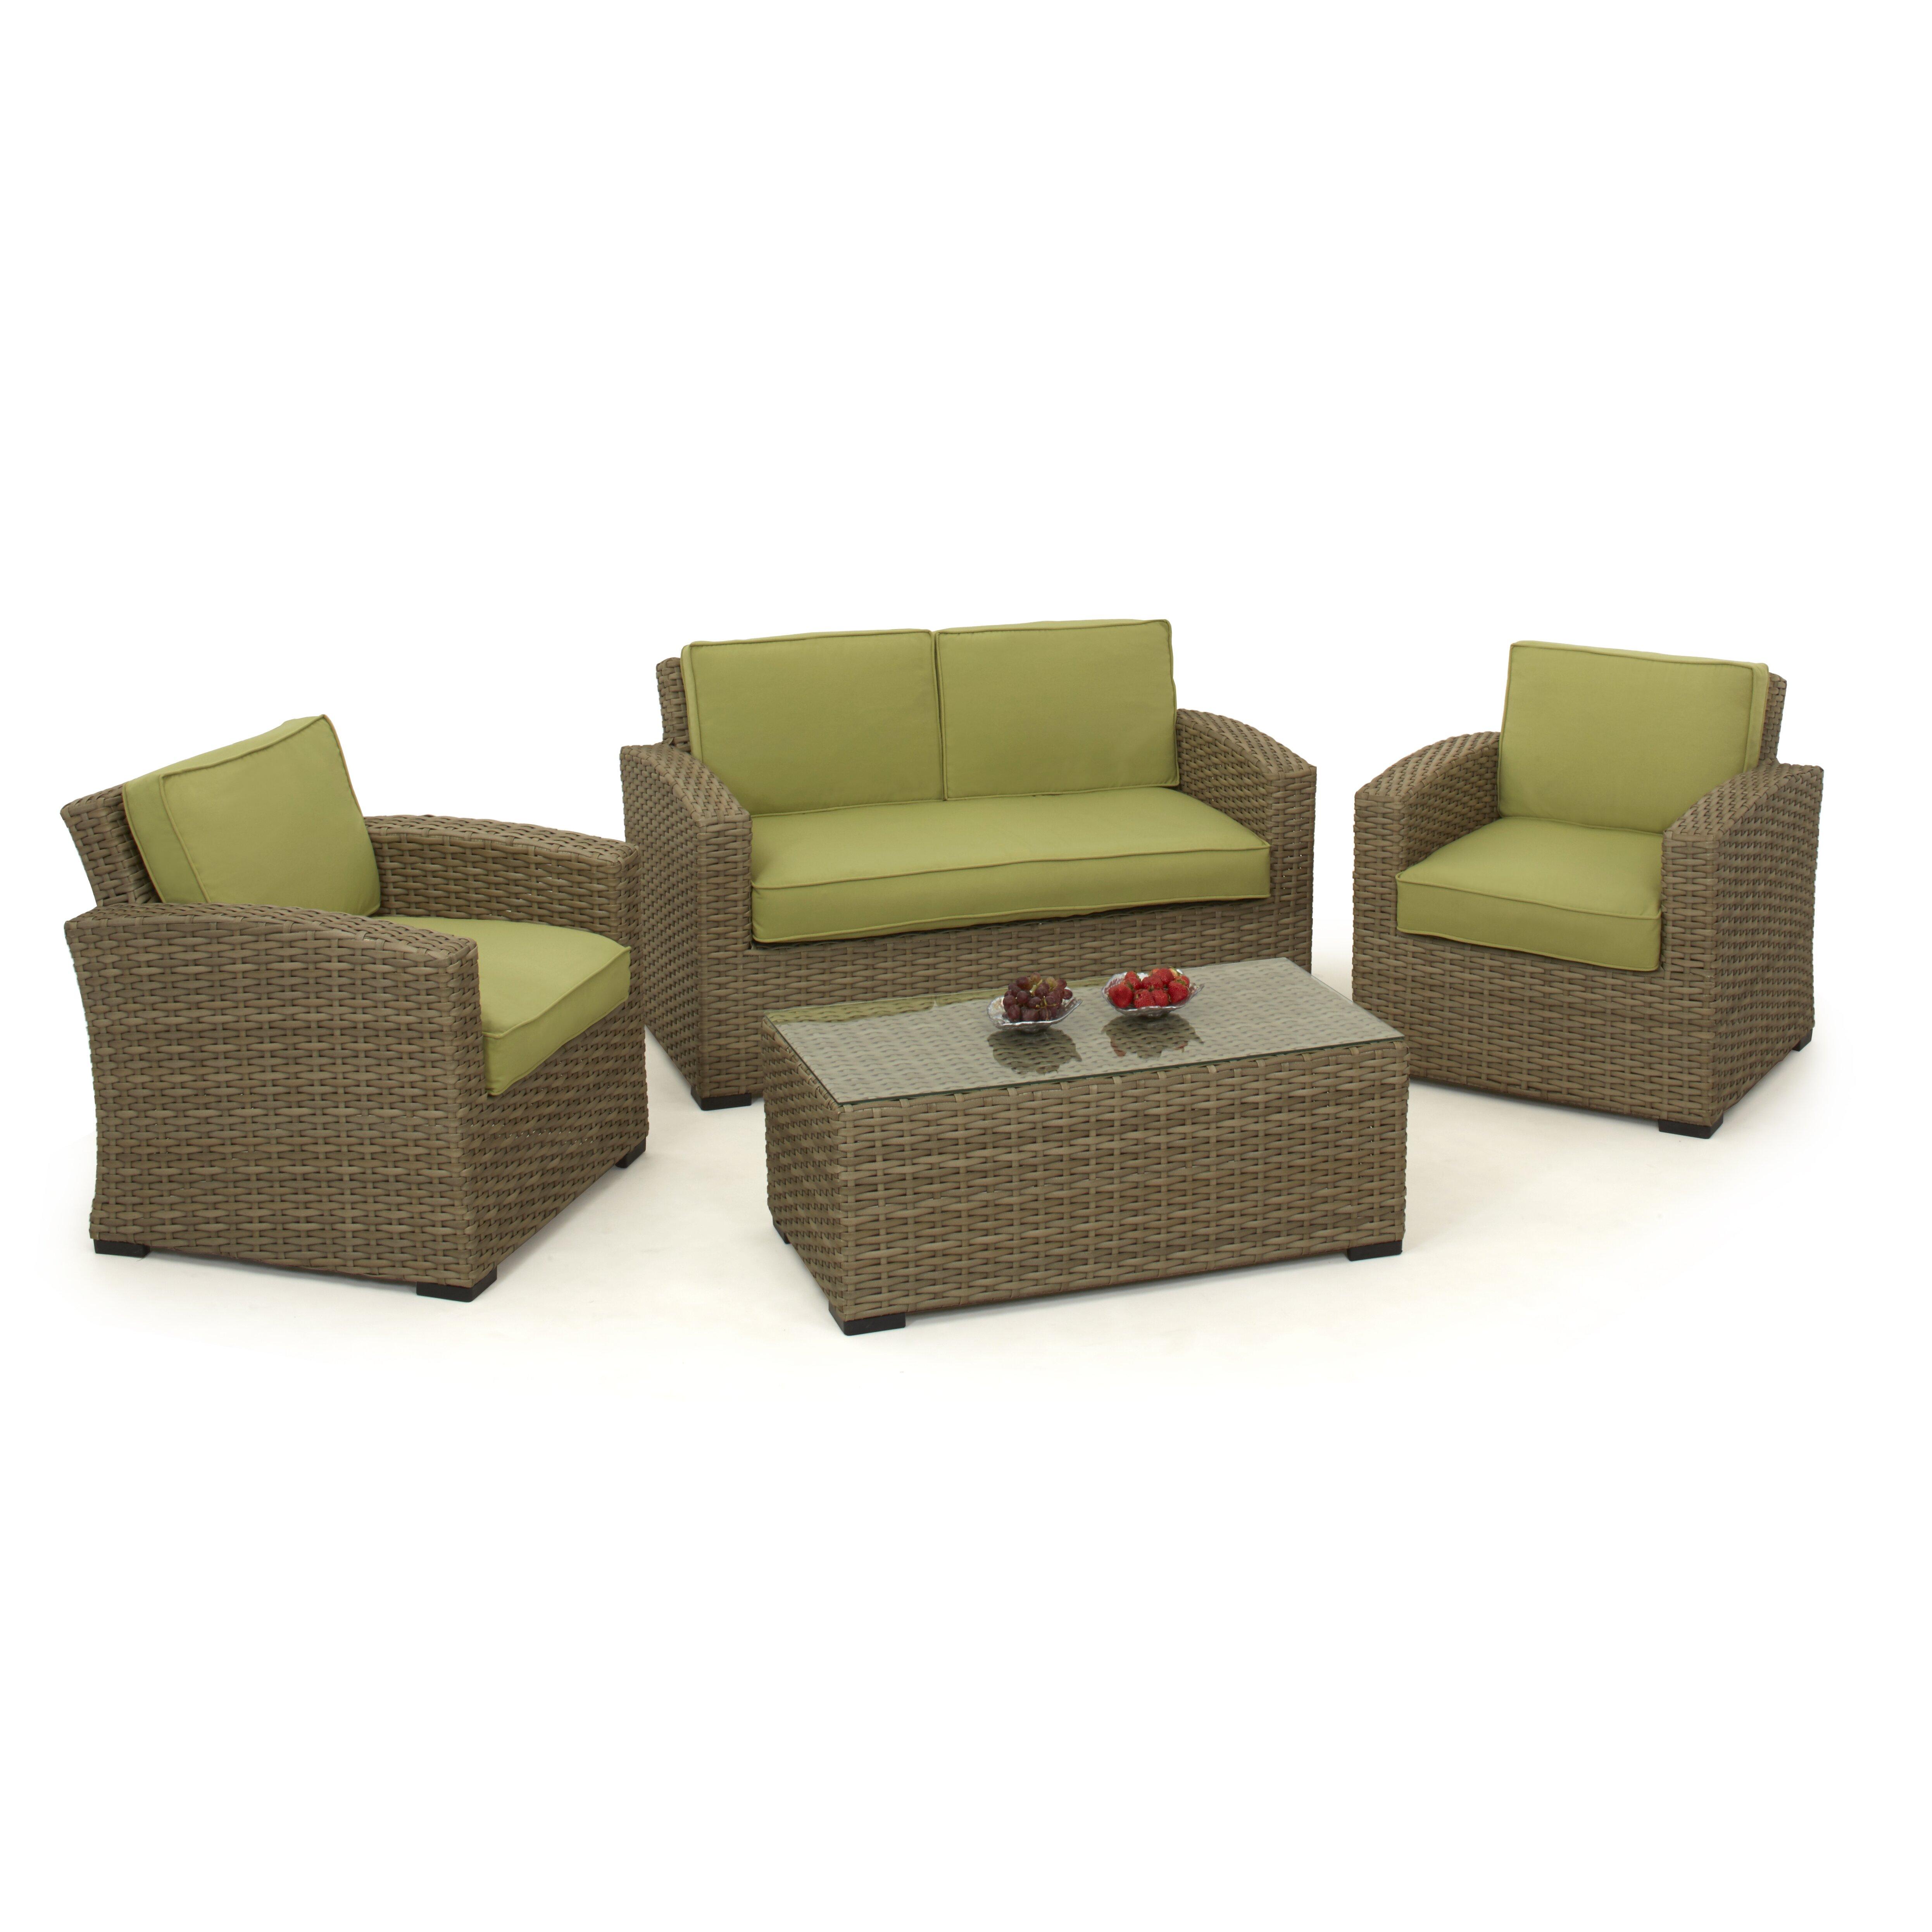 sofa set with low price list